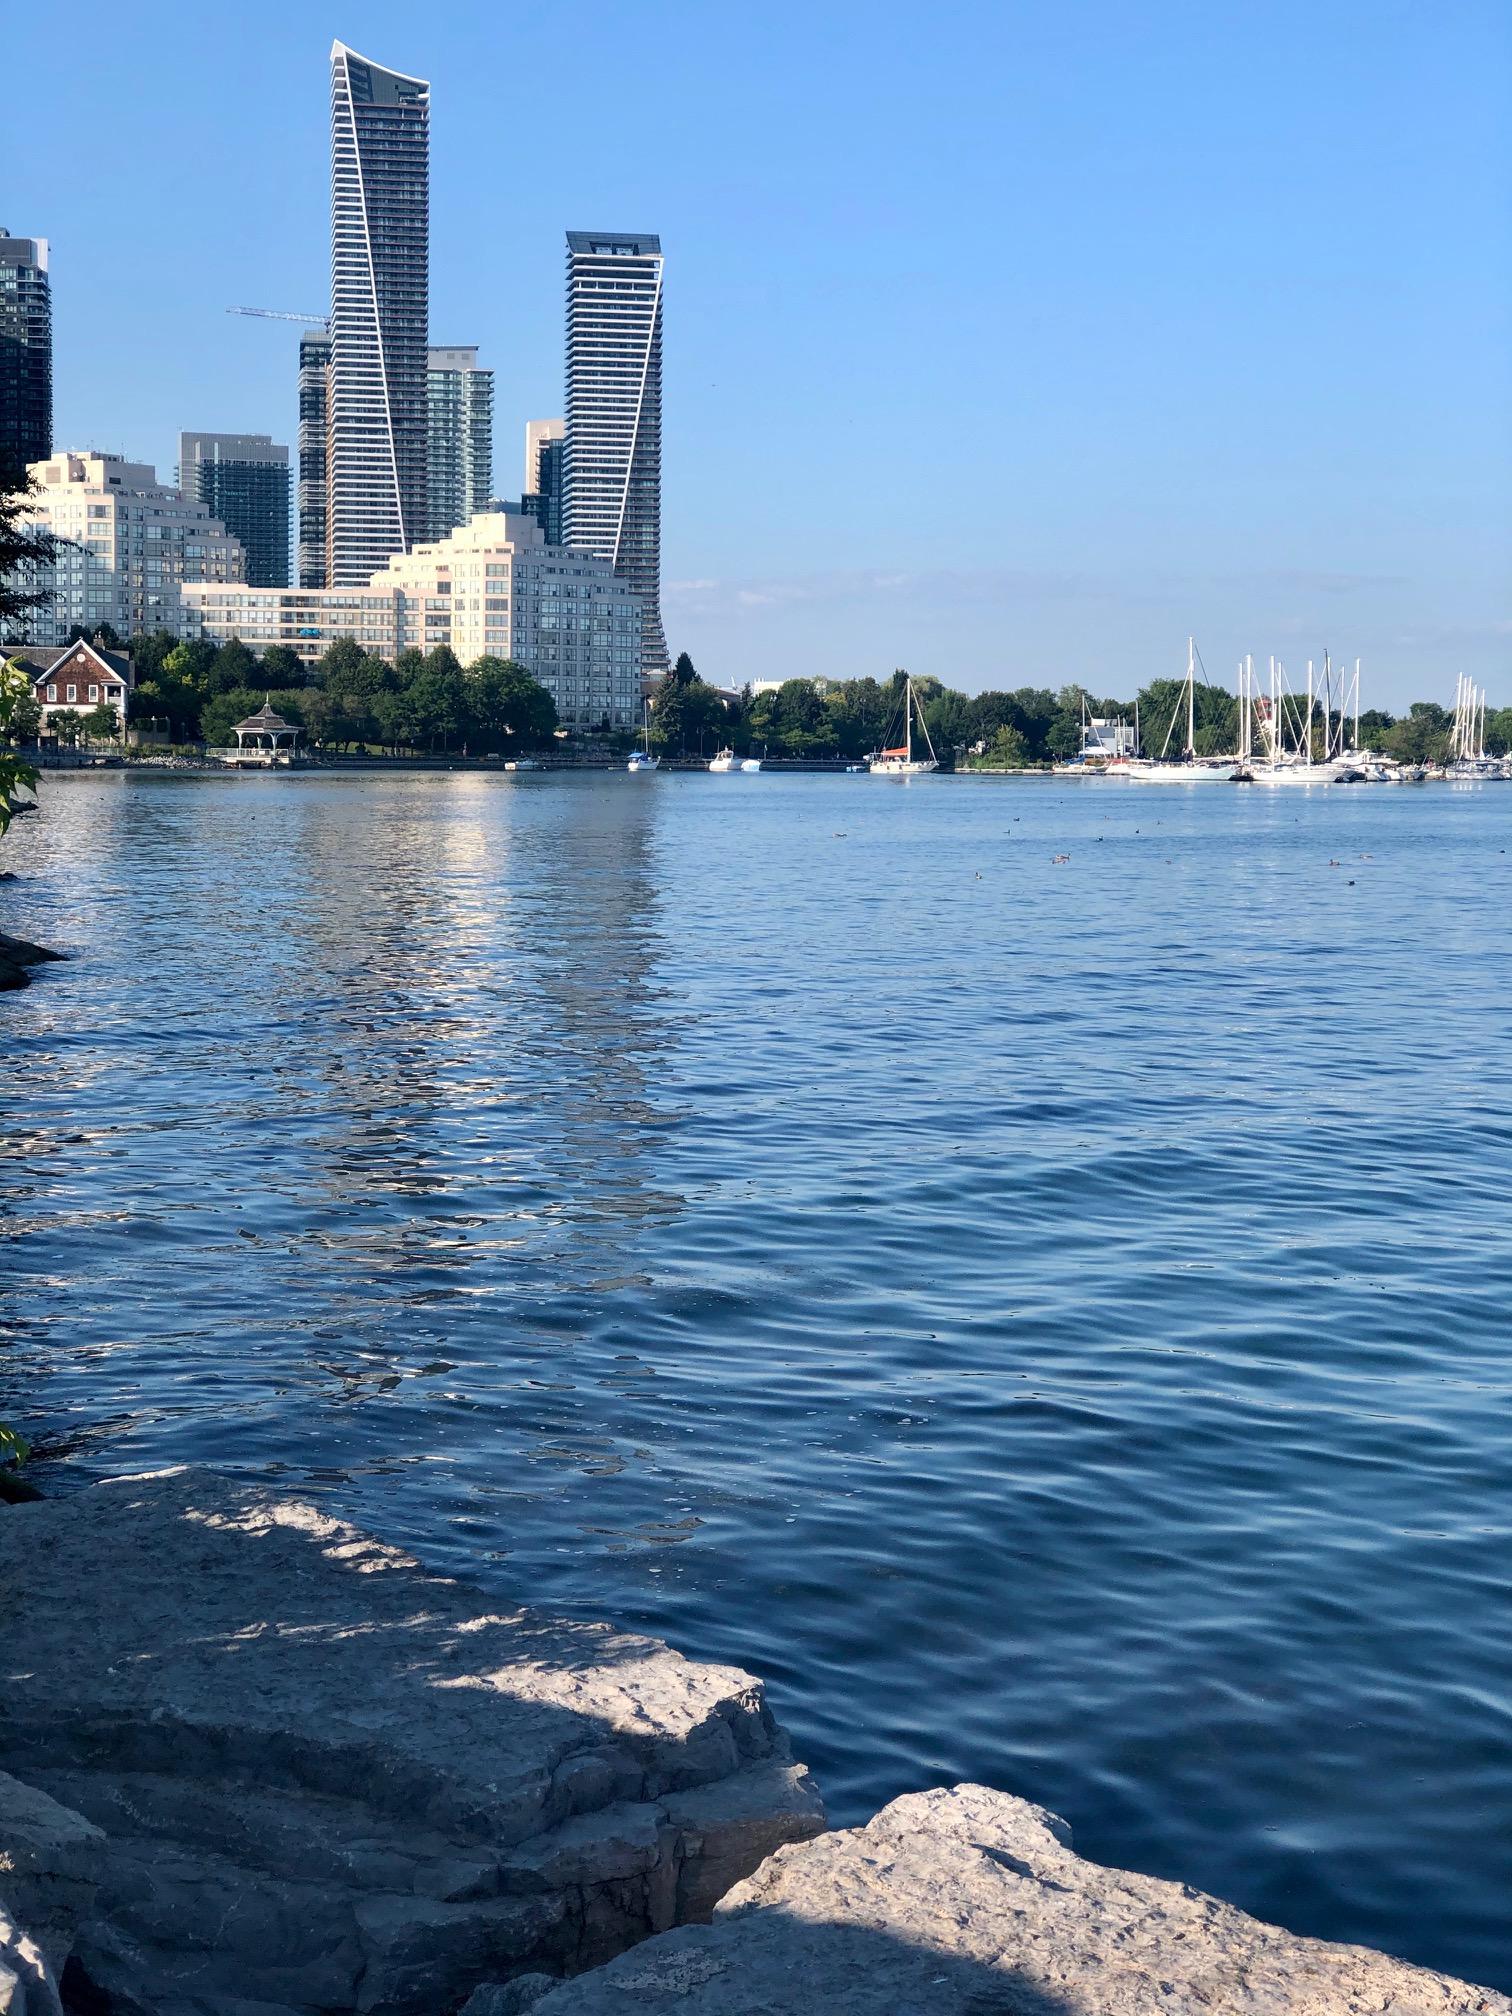 Mimico Waterfront